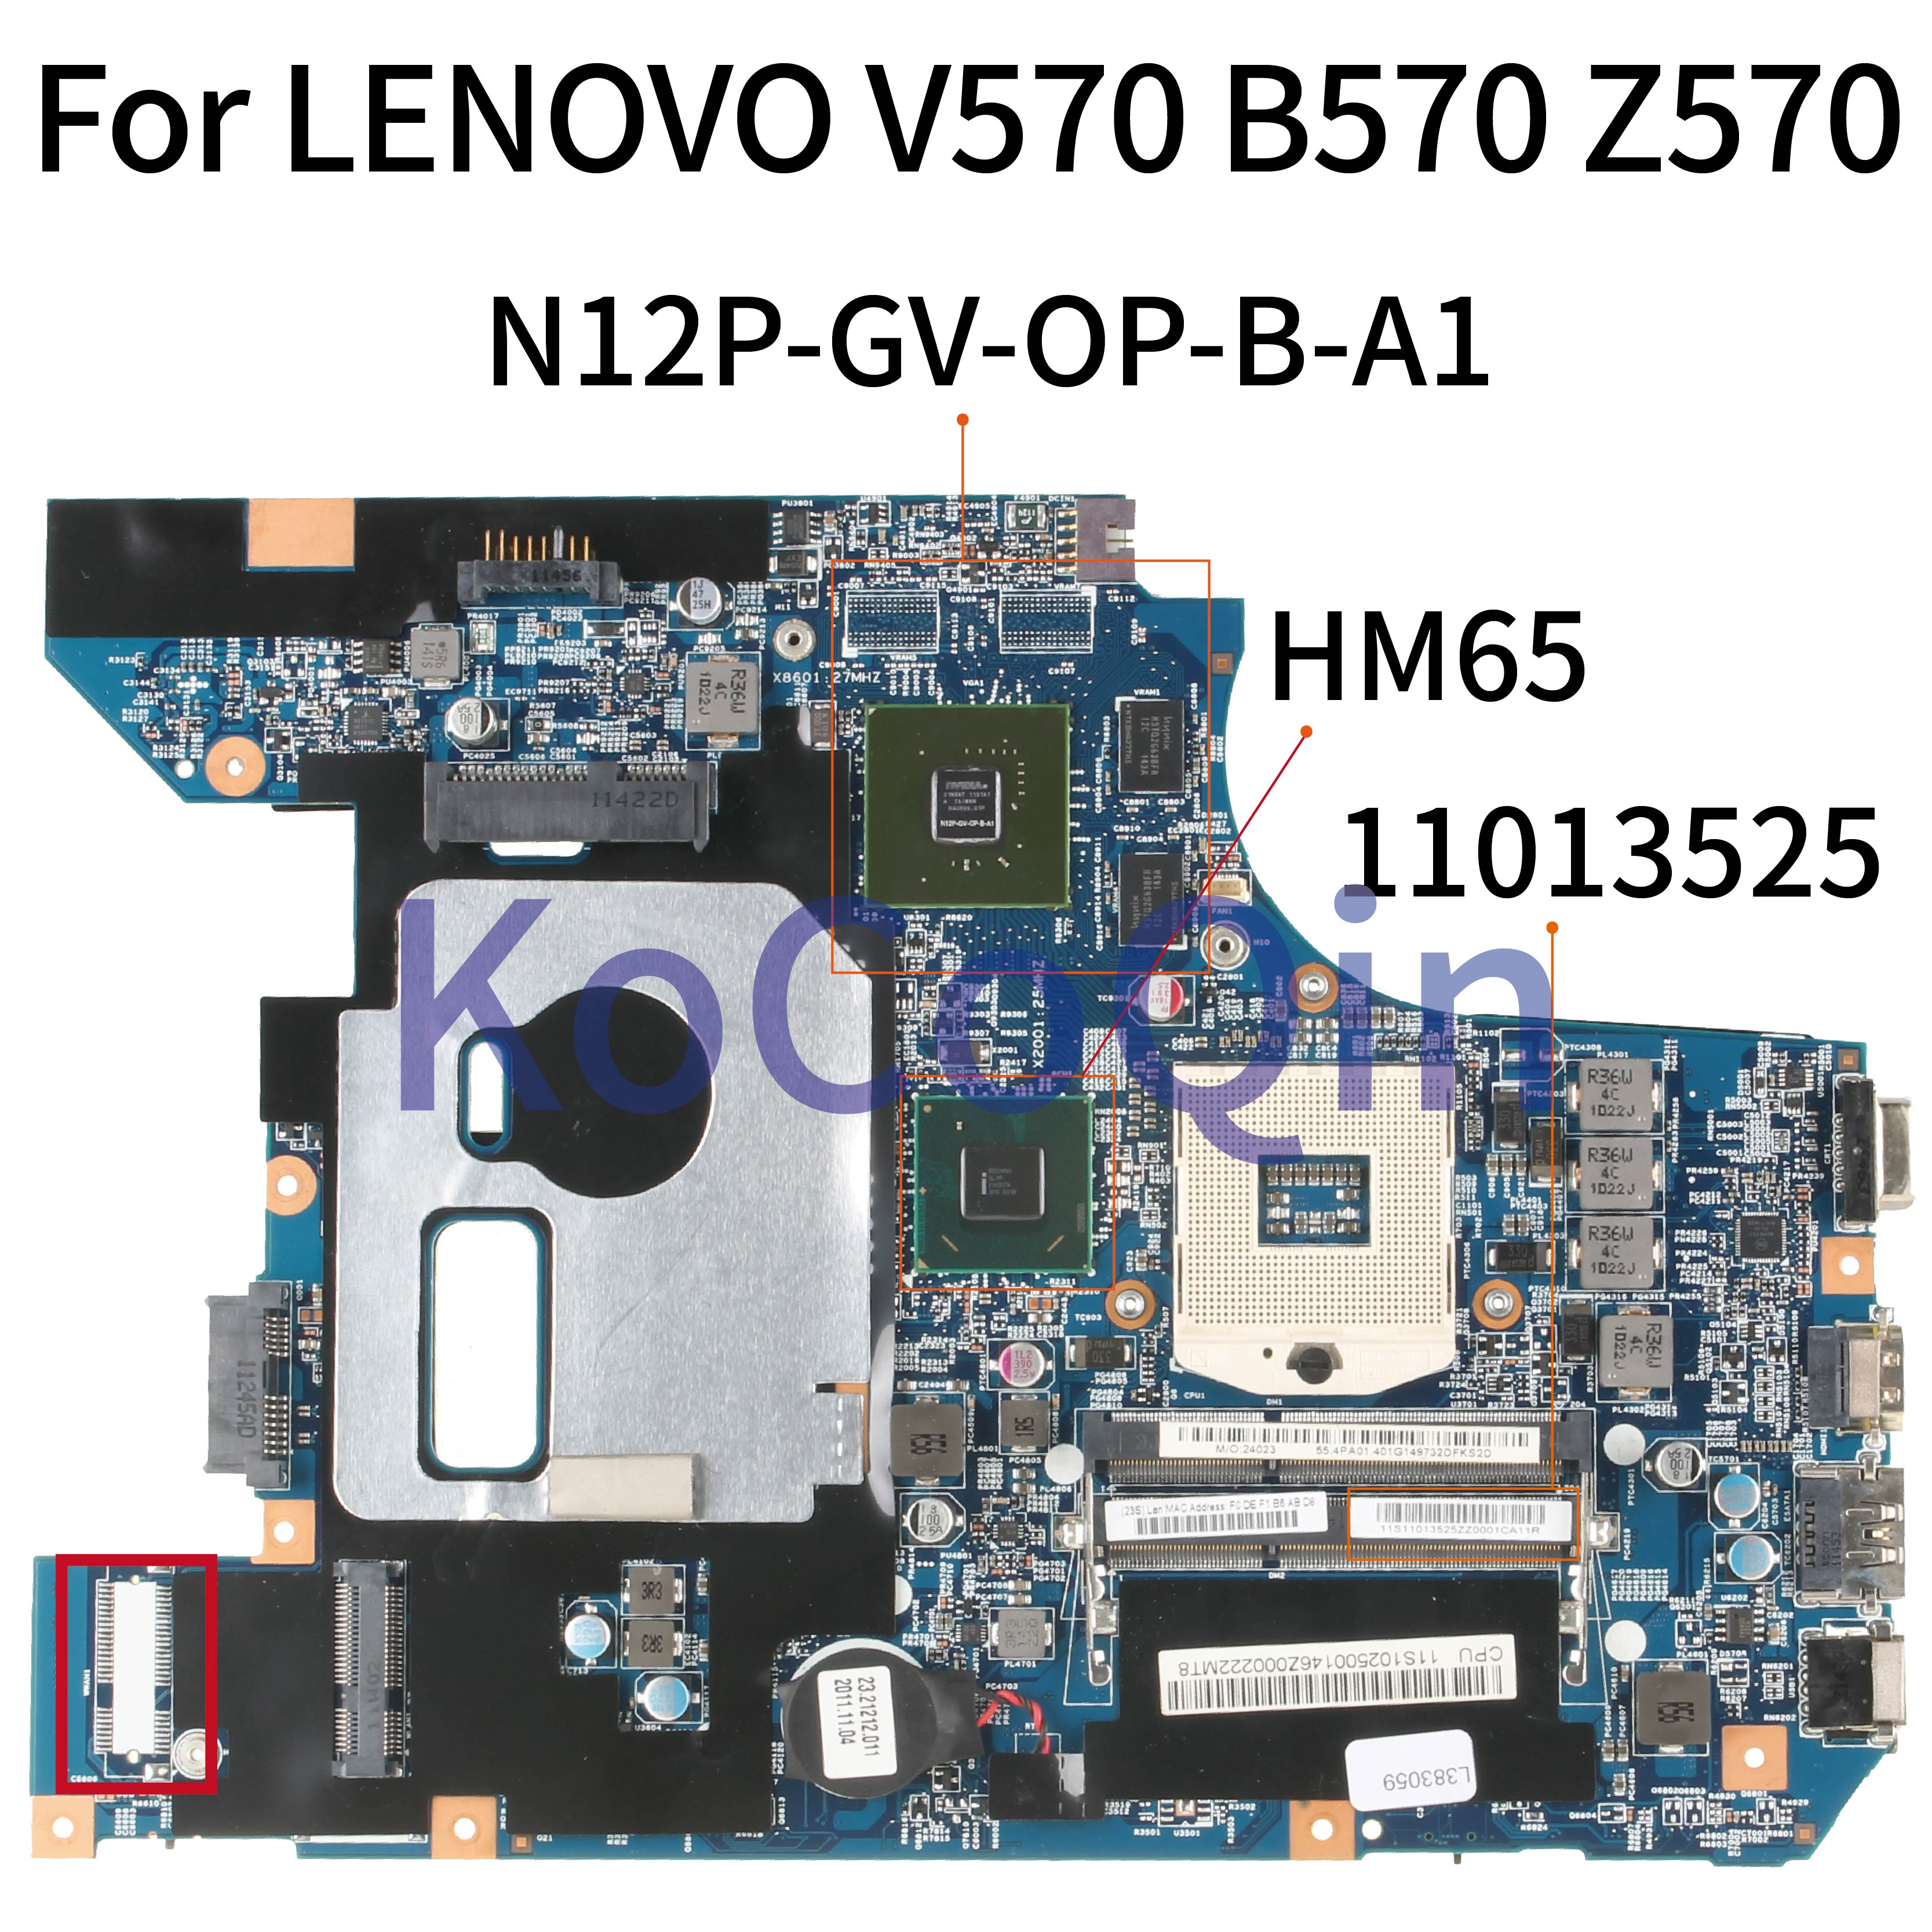 KoCoQin Laptop Motherboard For LENOVO V570 B570 Z570 HM65 N12P-GV-OP-B-A1 Mainboard 10290-2 48.4PA01.021 LZ57 11013525